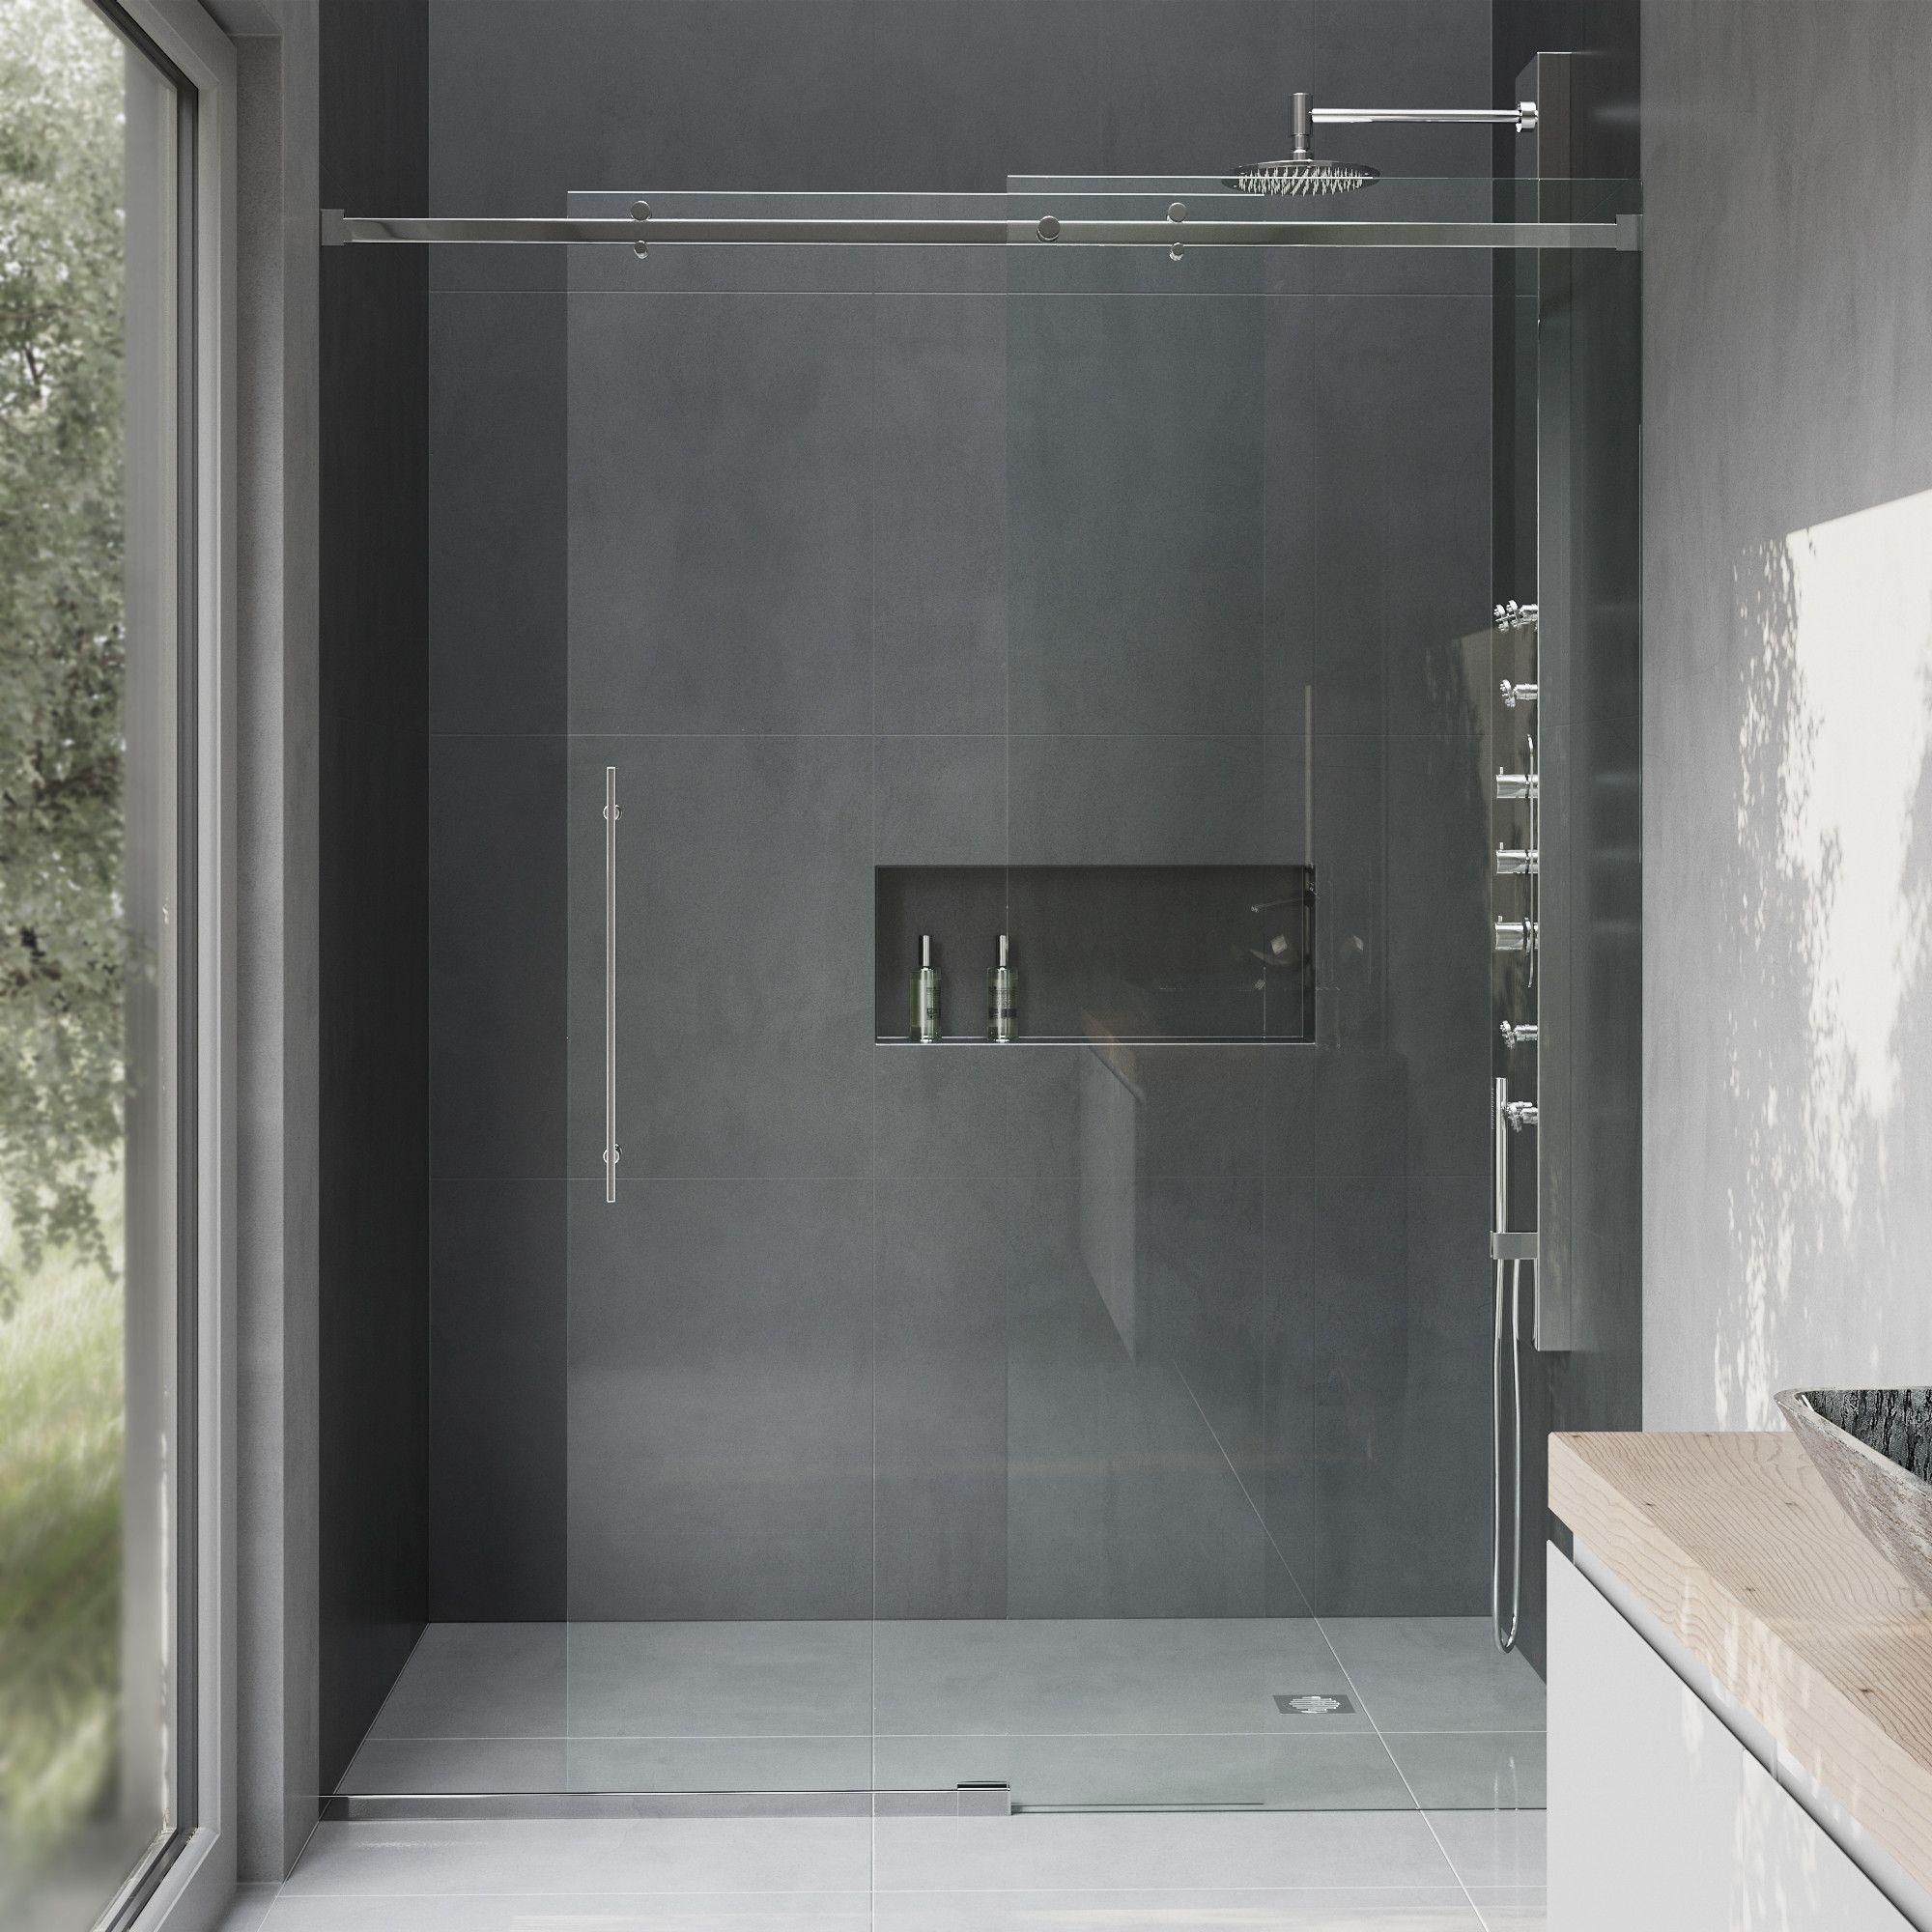 uncategorized full in corner size doors x sanibel of photos frameless door vigo for shower bypass glass concept exceptional